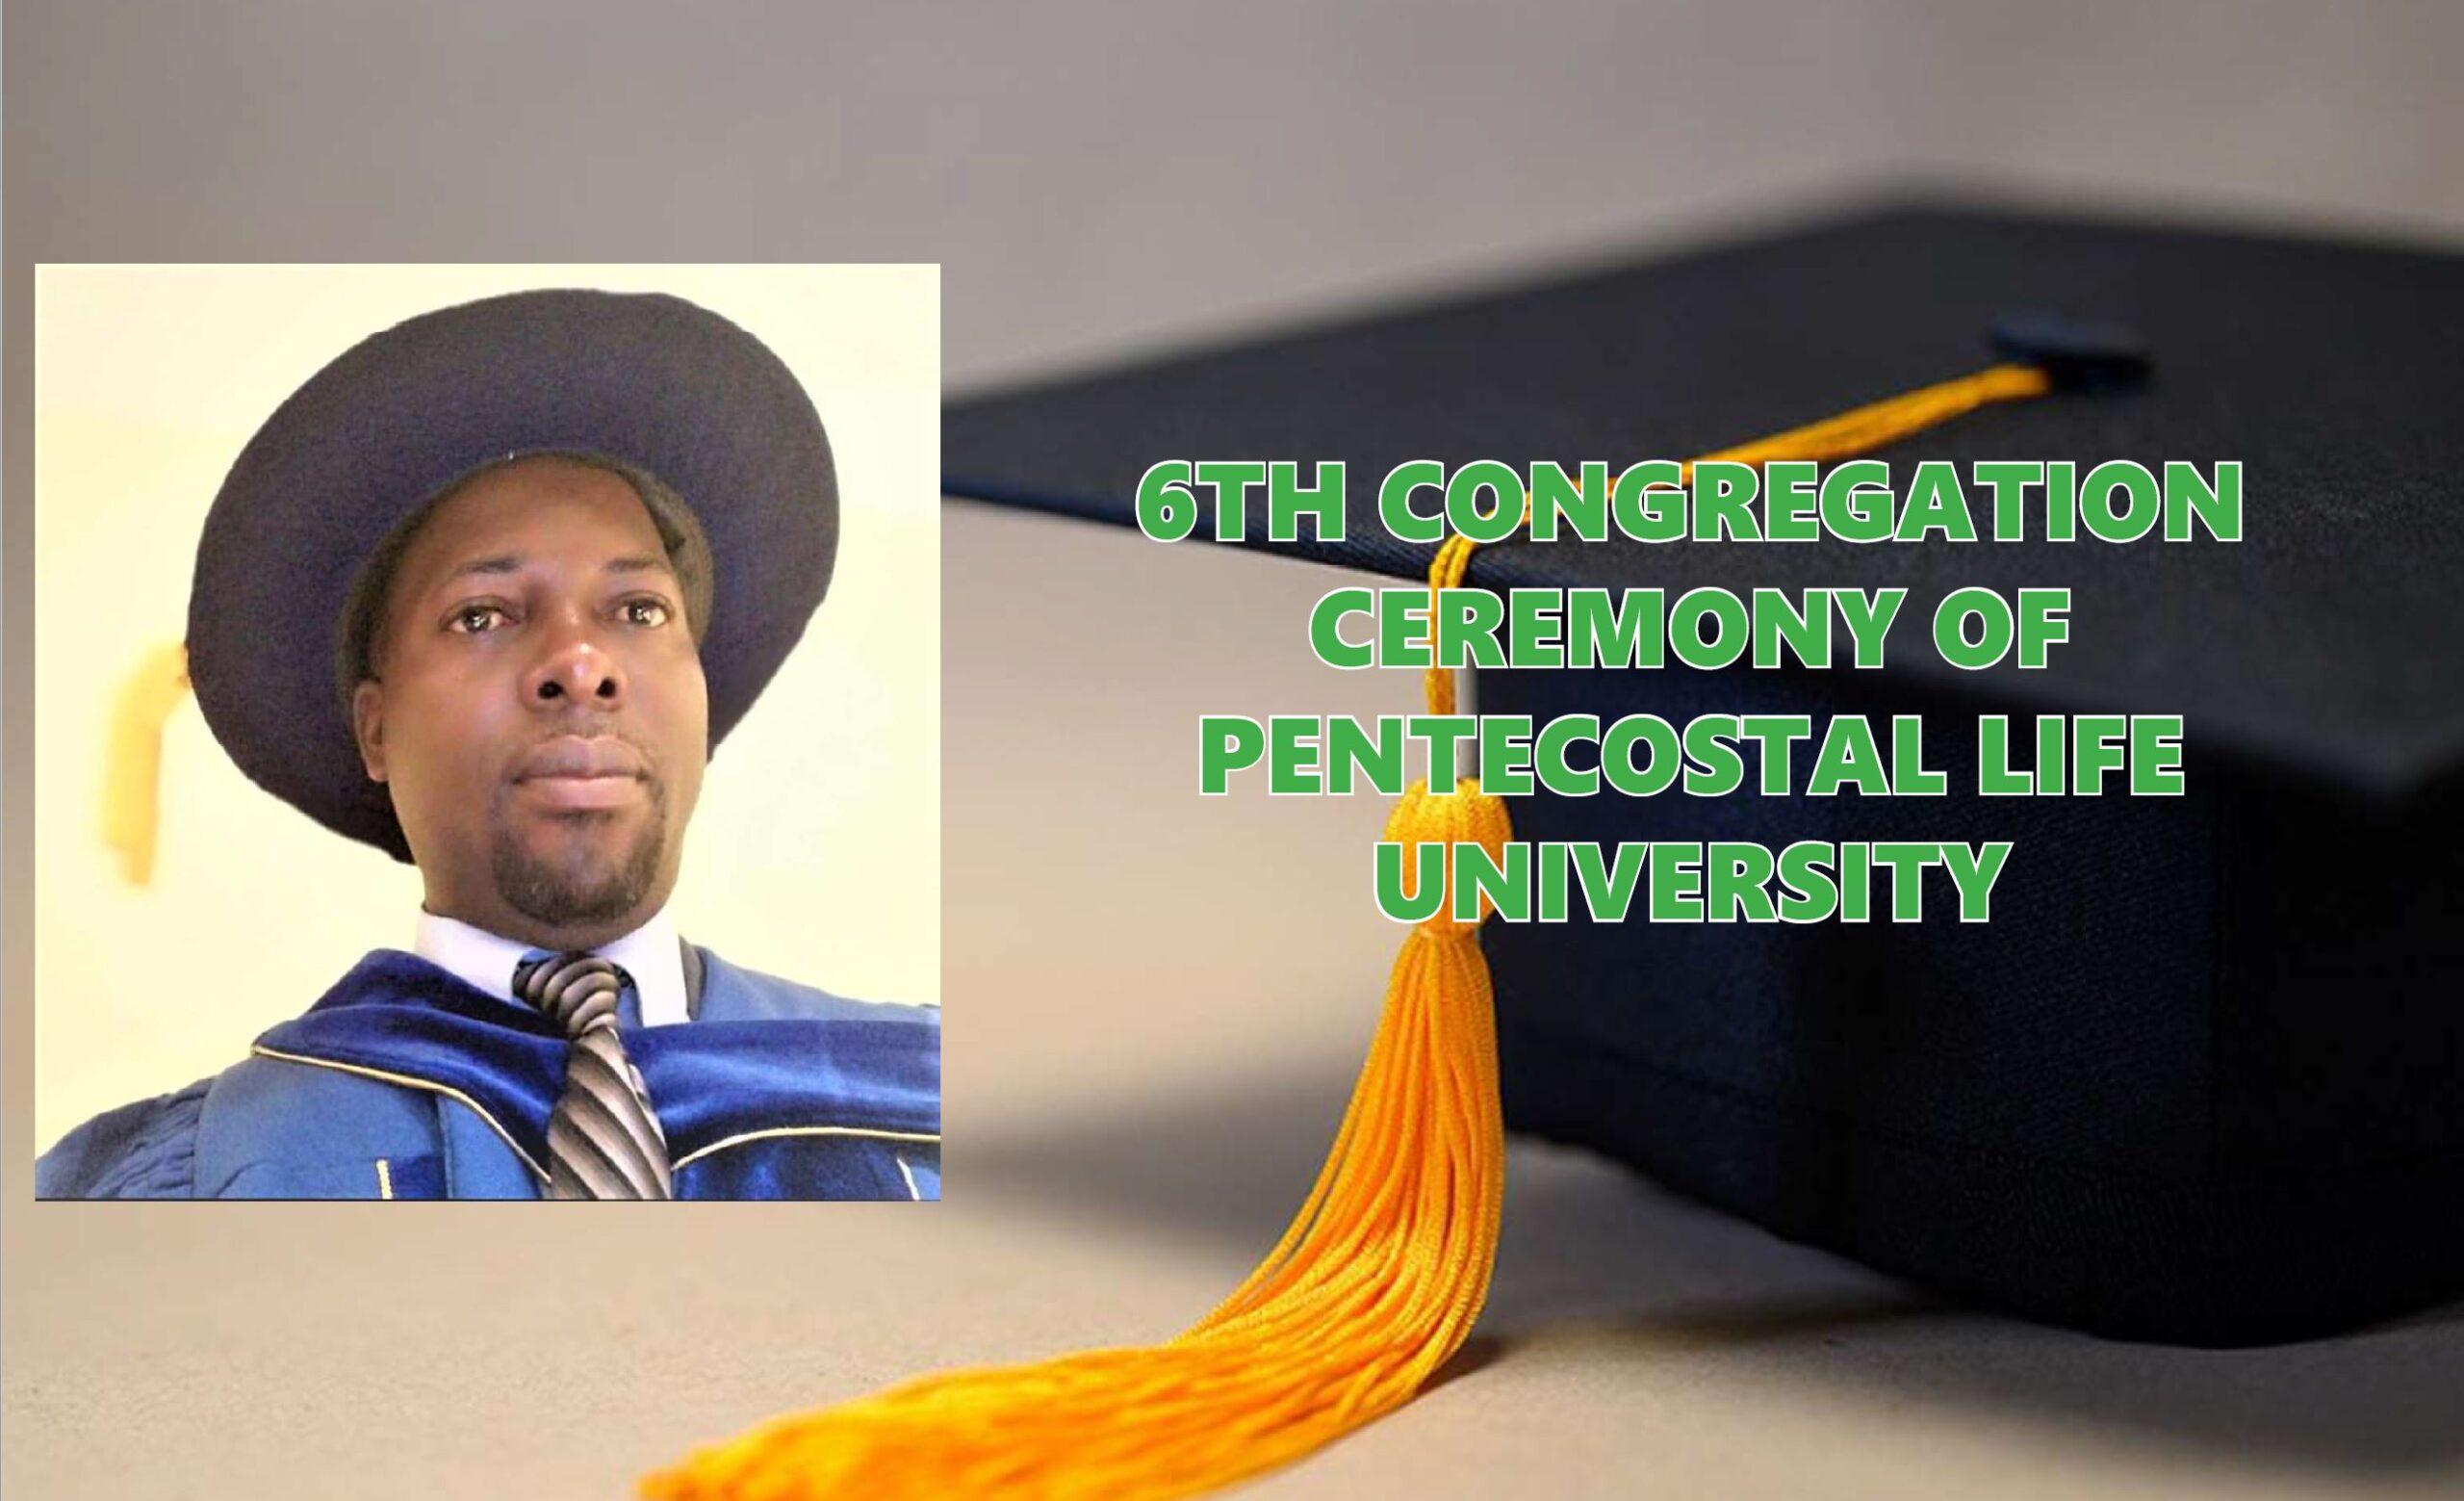 NPC Director General's Speech at the 6th Congregation Ceremony of Pentecostal Life University